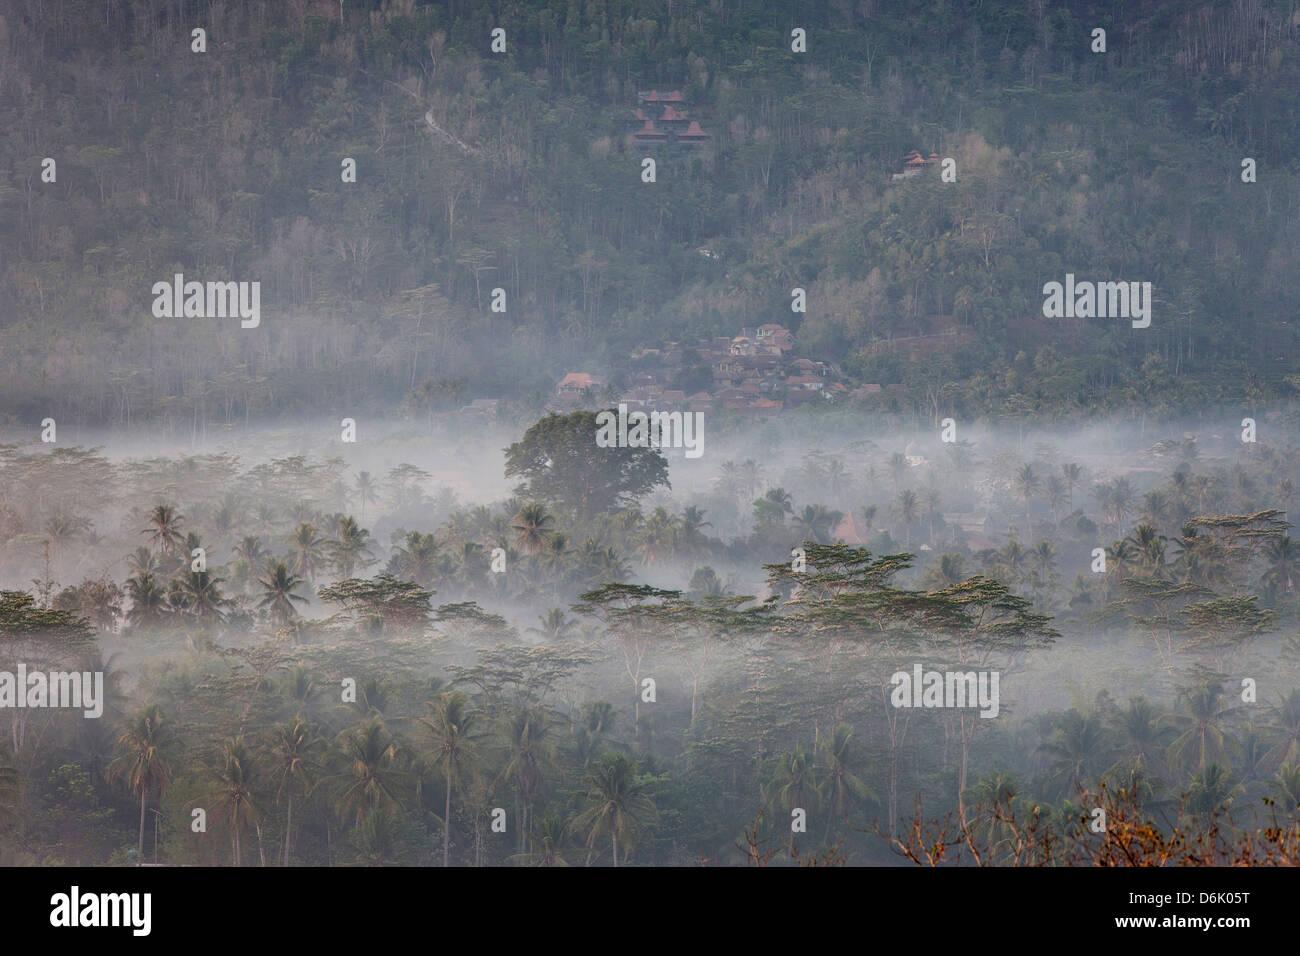 Wald in Java, Indonesien, Südostasien, Asien Stockbild